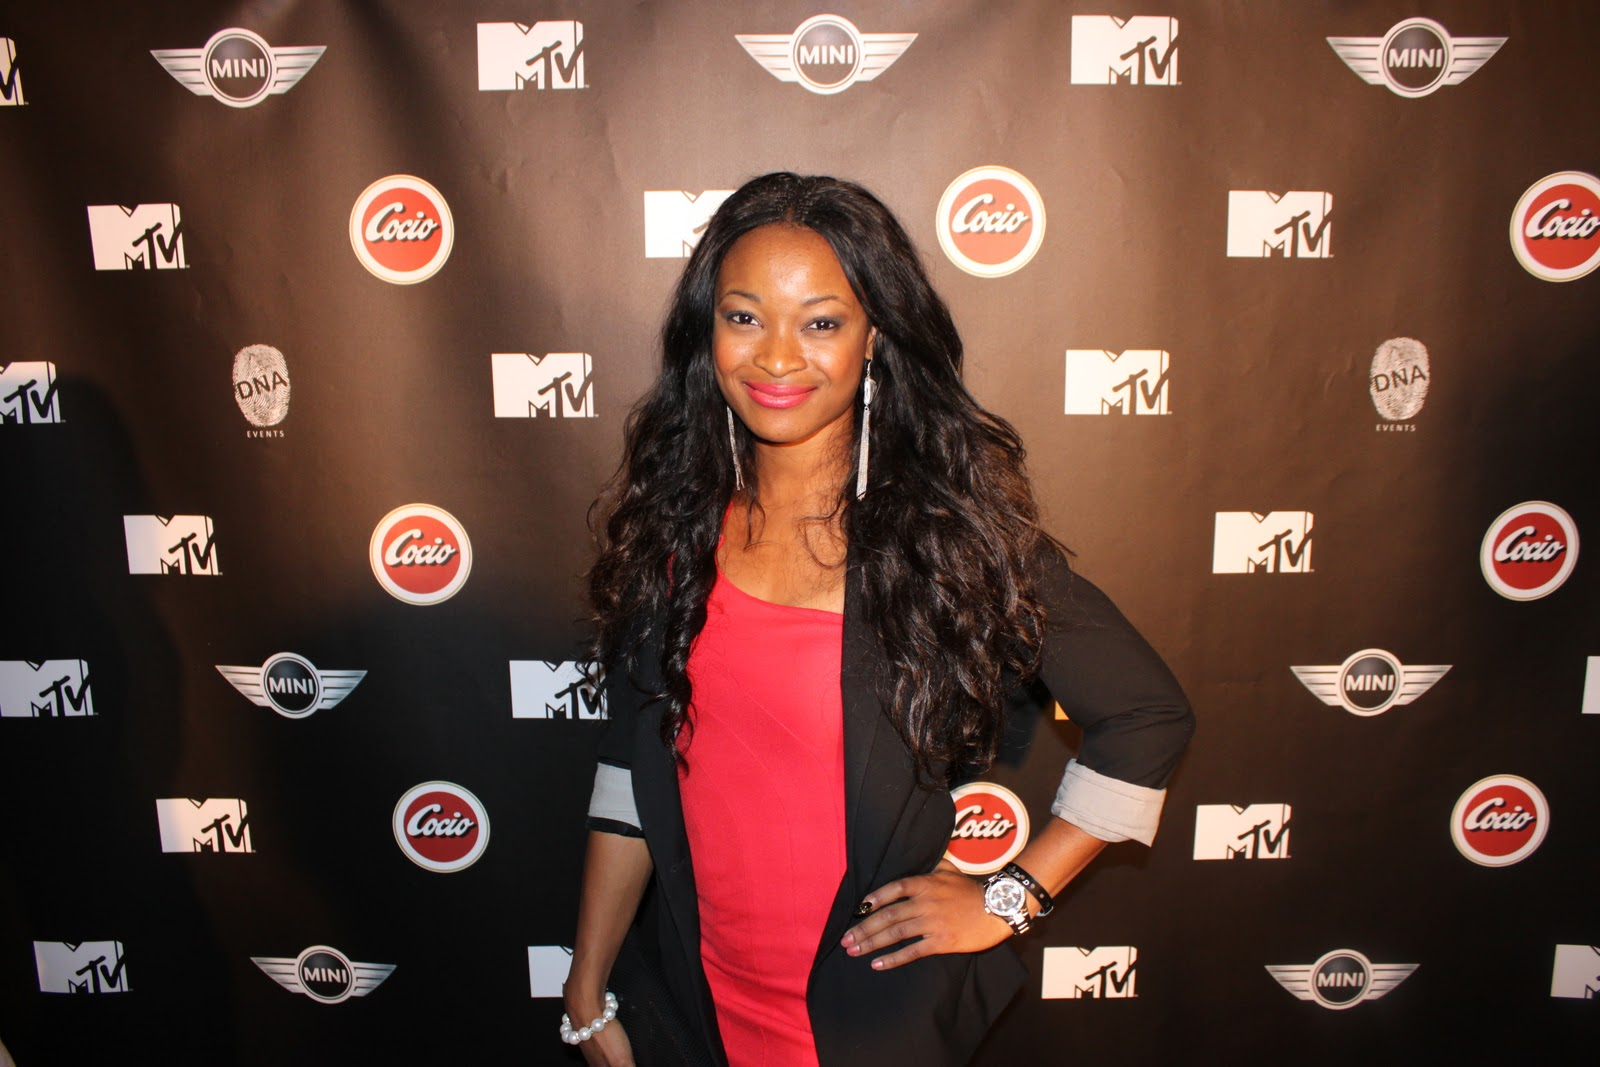 Chioma - Beauty Blogger: MTV Norway 6 year anniversary